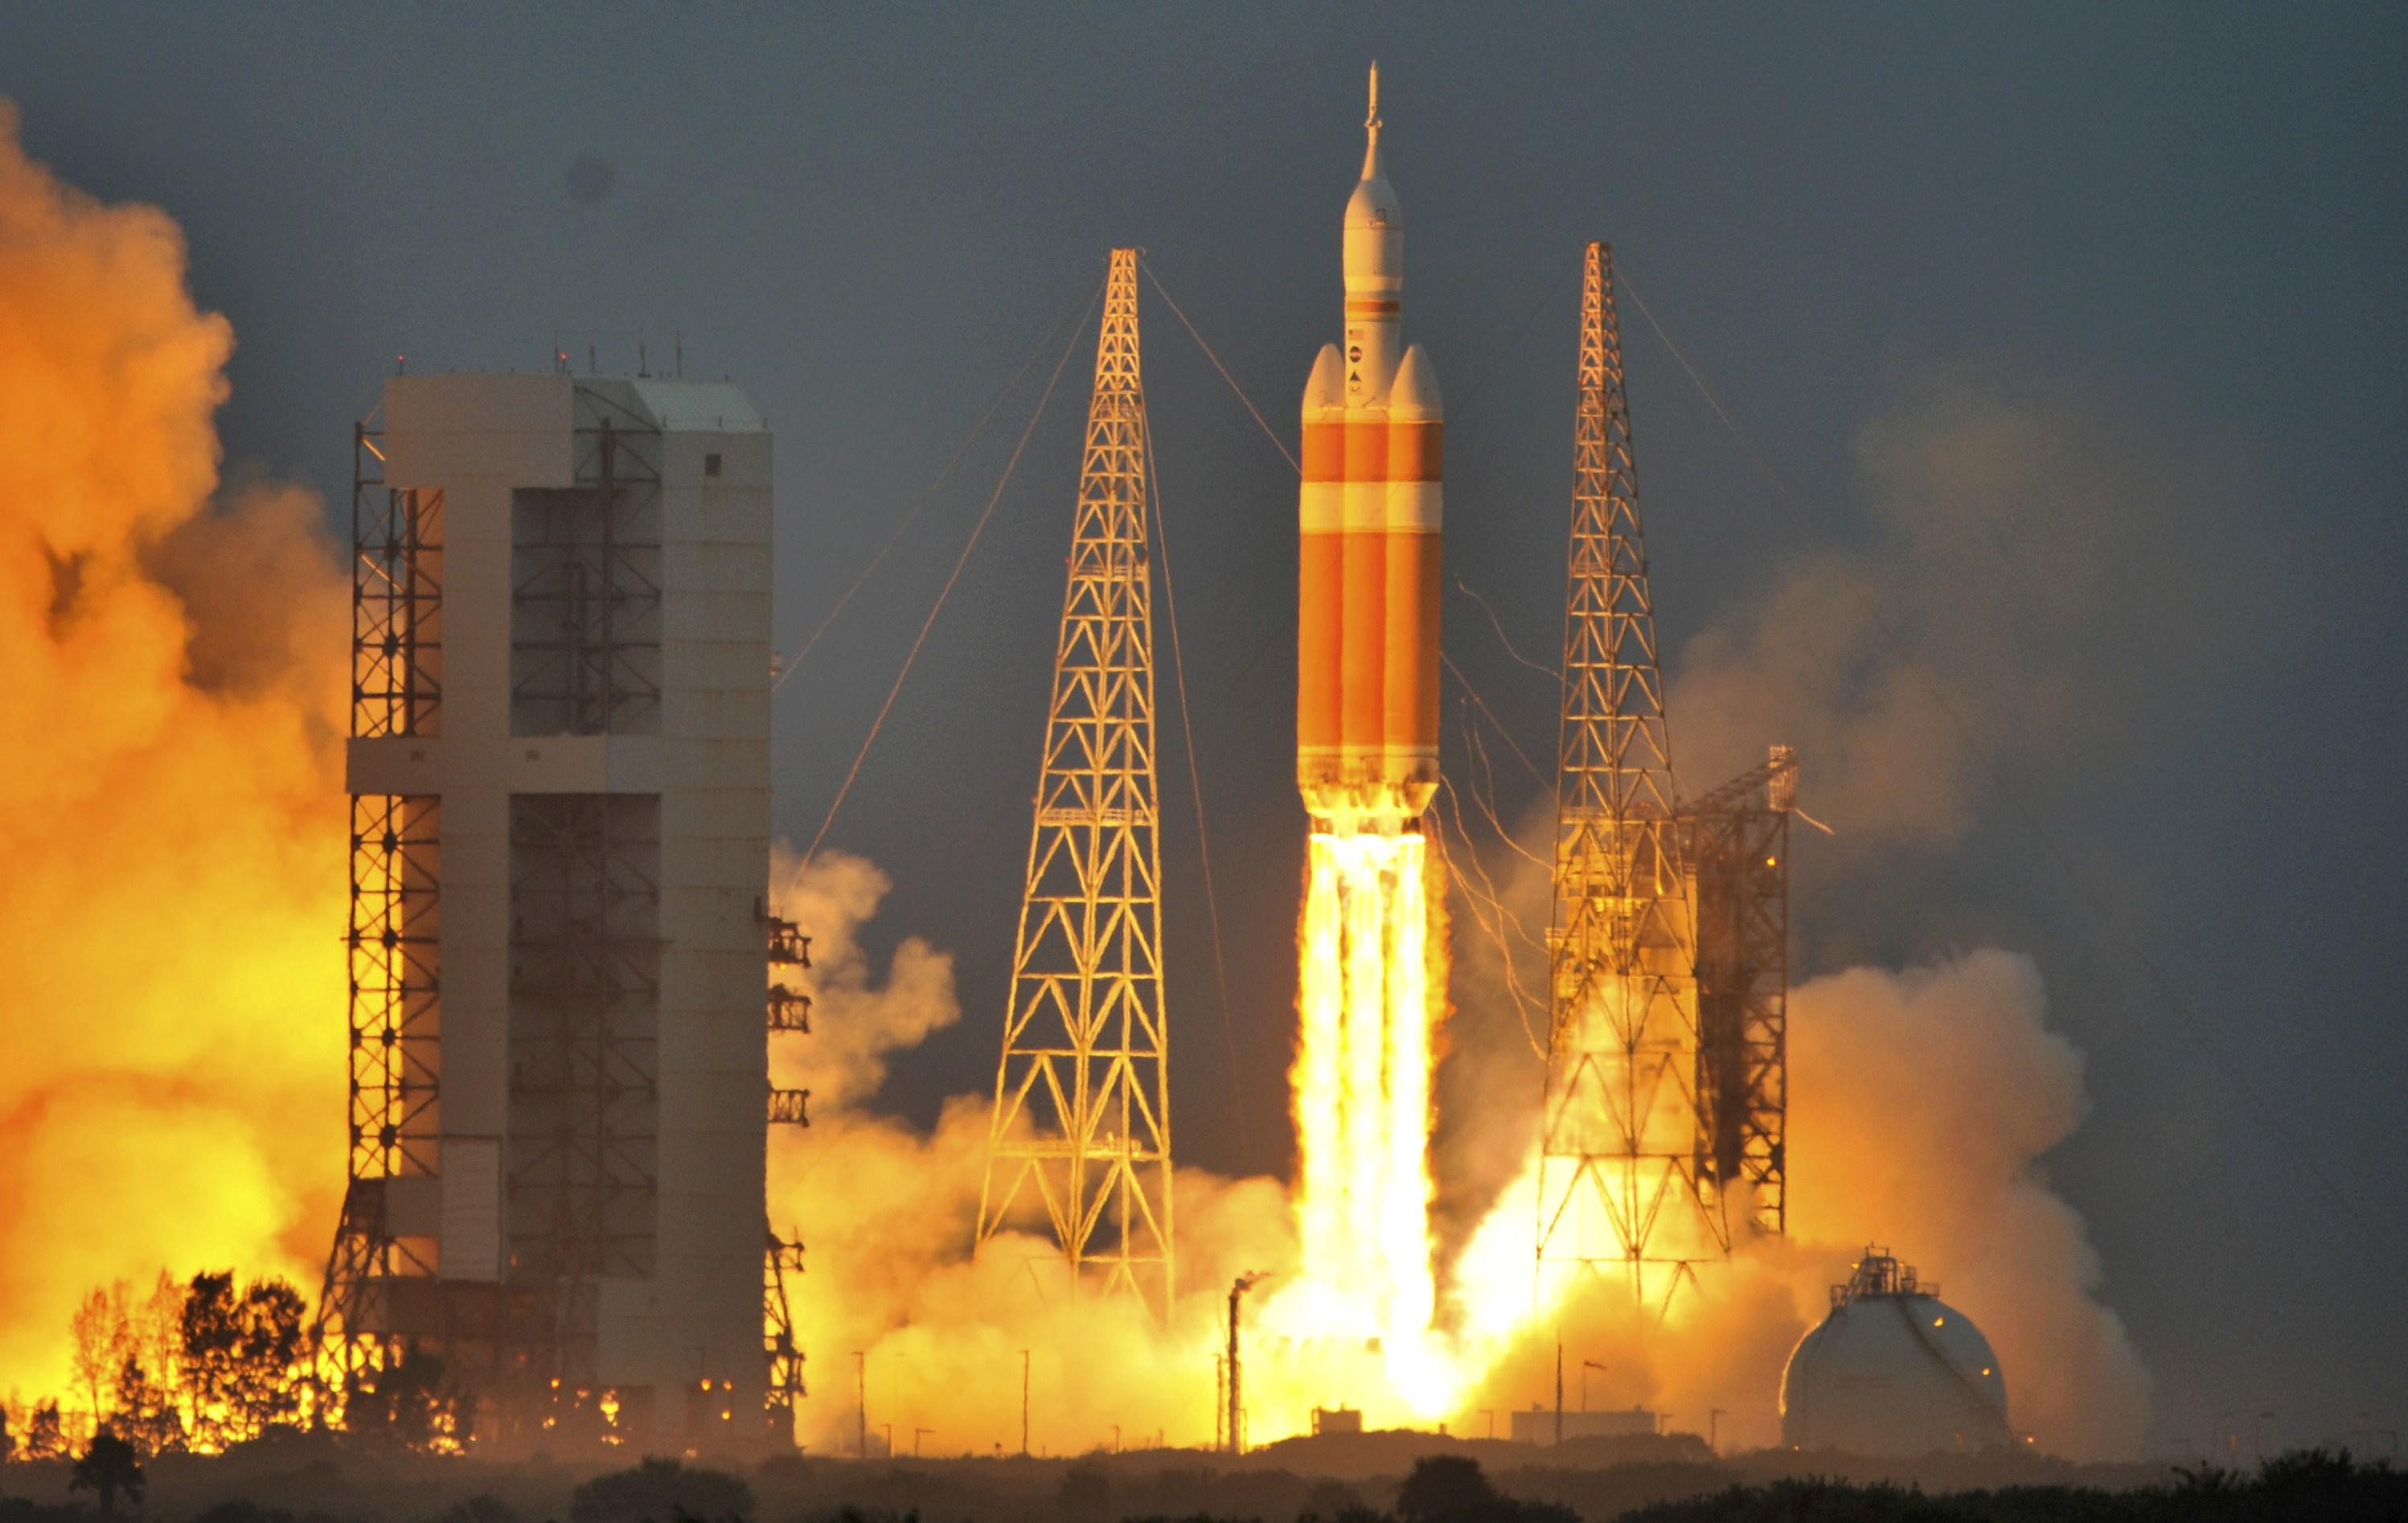 orion spacecraft logo - photo #34